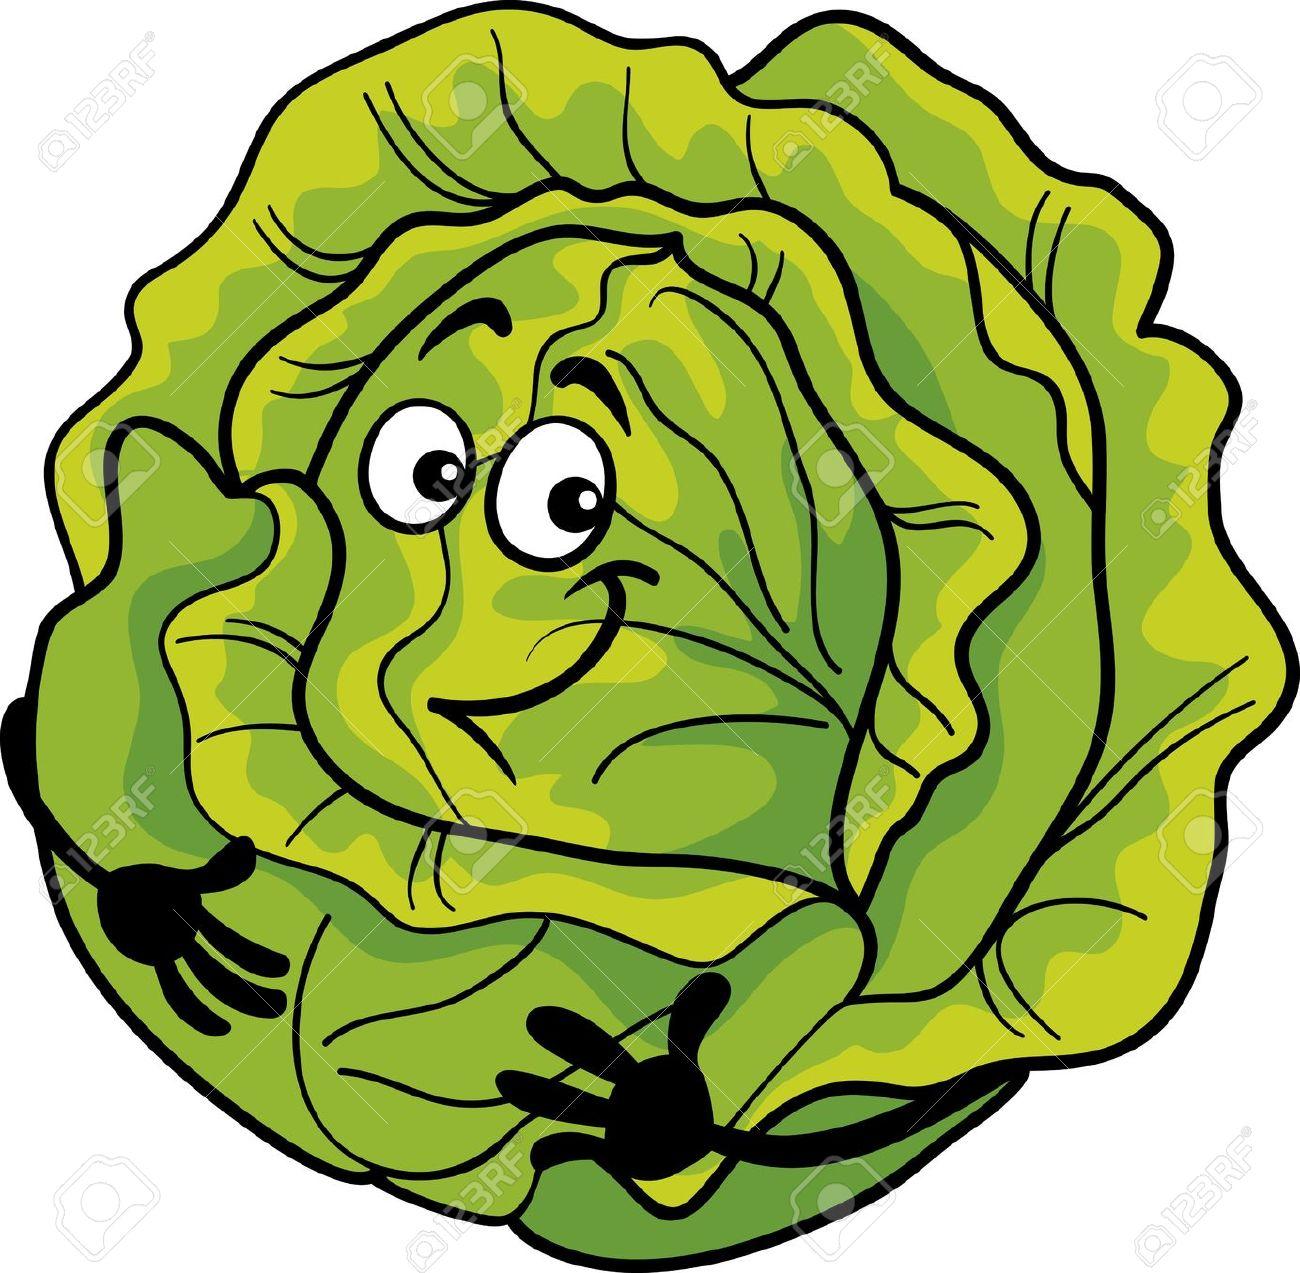 Lettuce head clipart.